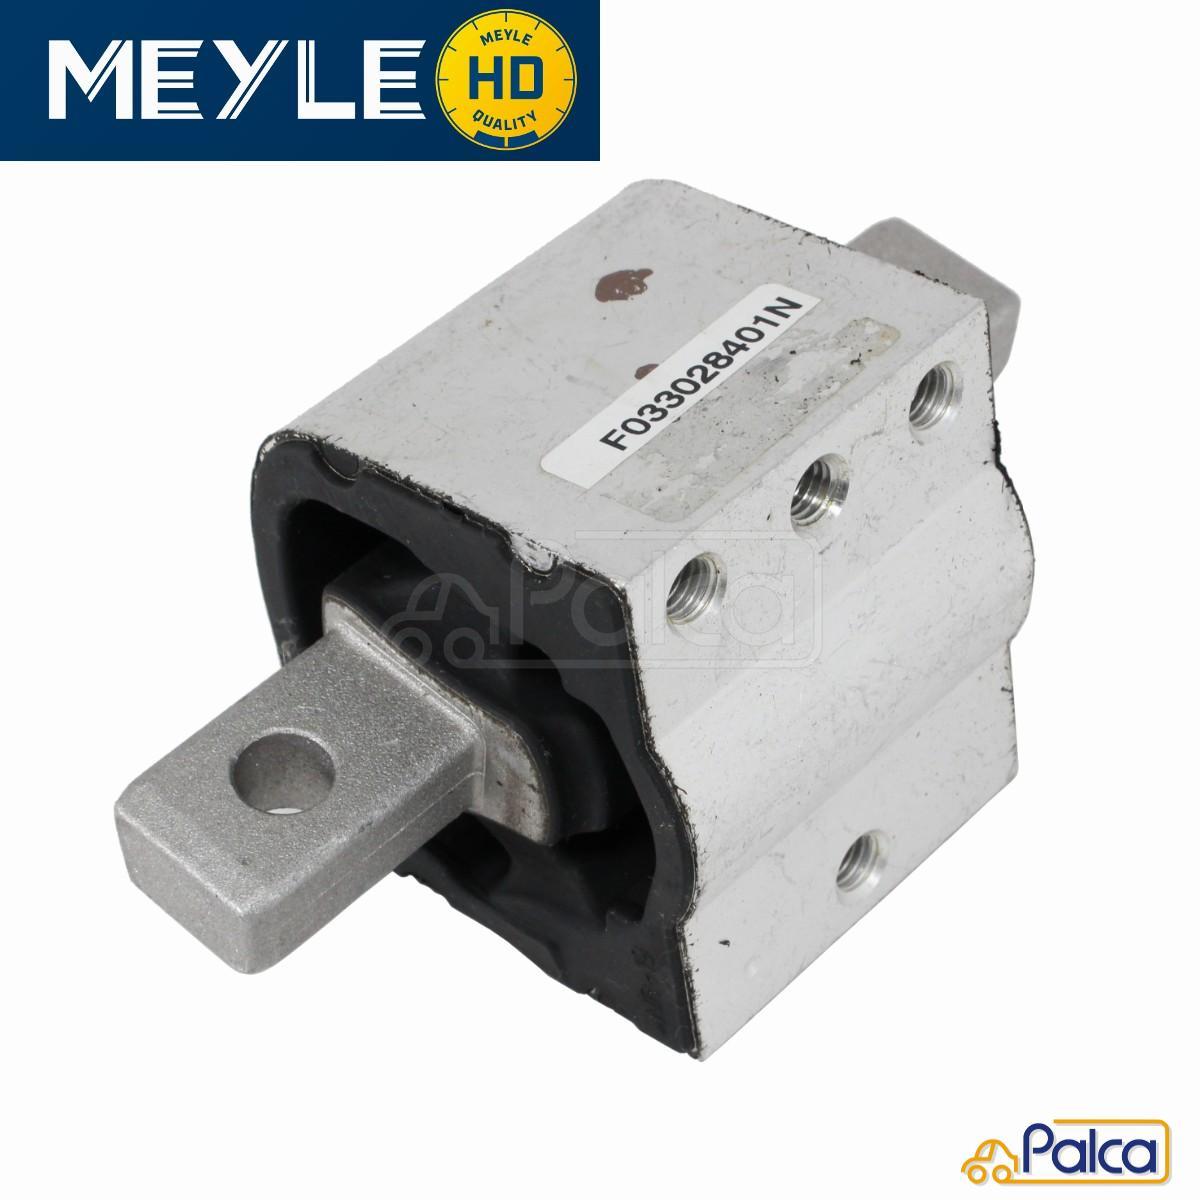 MEYLE製 新品 あす楽 ベンツ お値打ち価格で ミッションマウント 強化HD品 W202 W210 激安格安割引情報満載 W220 W203 W208 W211 W140 C215 R170 C219 W463 A208 R129 R171 A209 C209 C208 W212 A207 C207 C218 R230